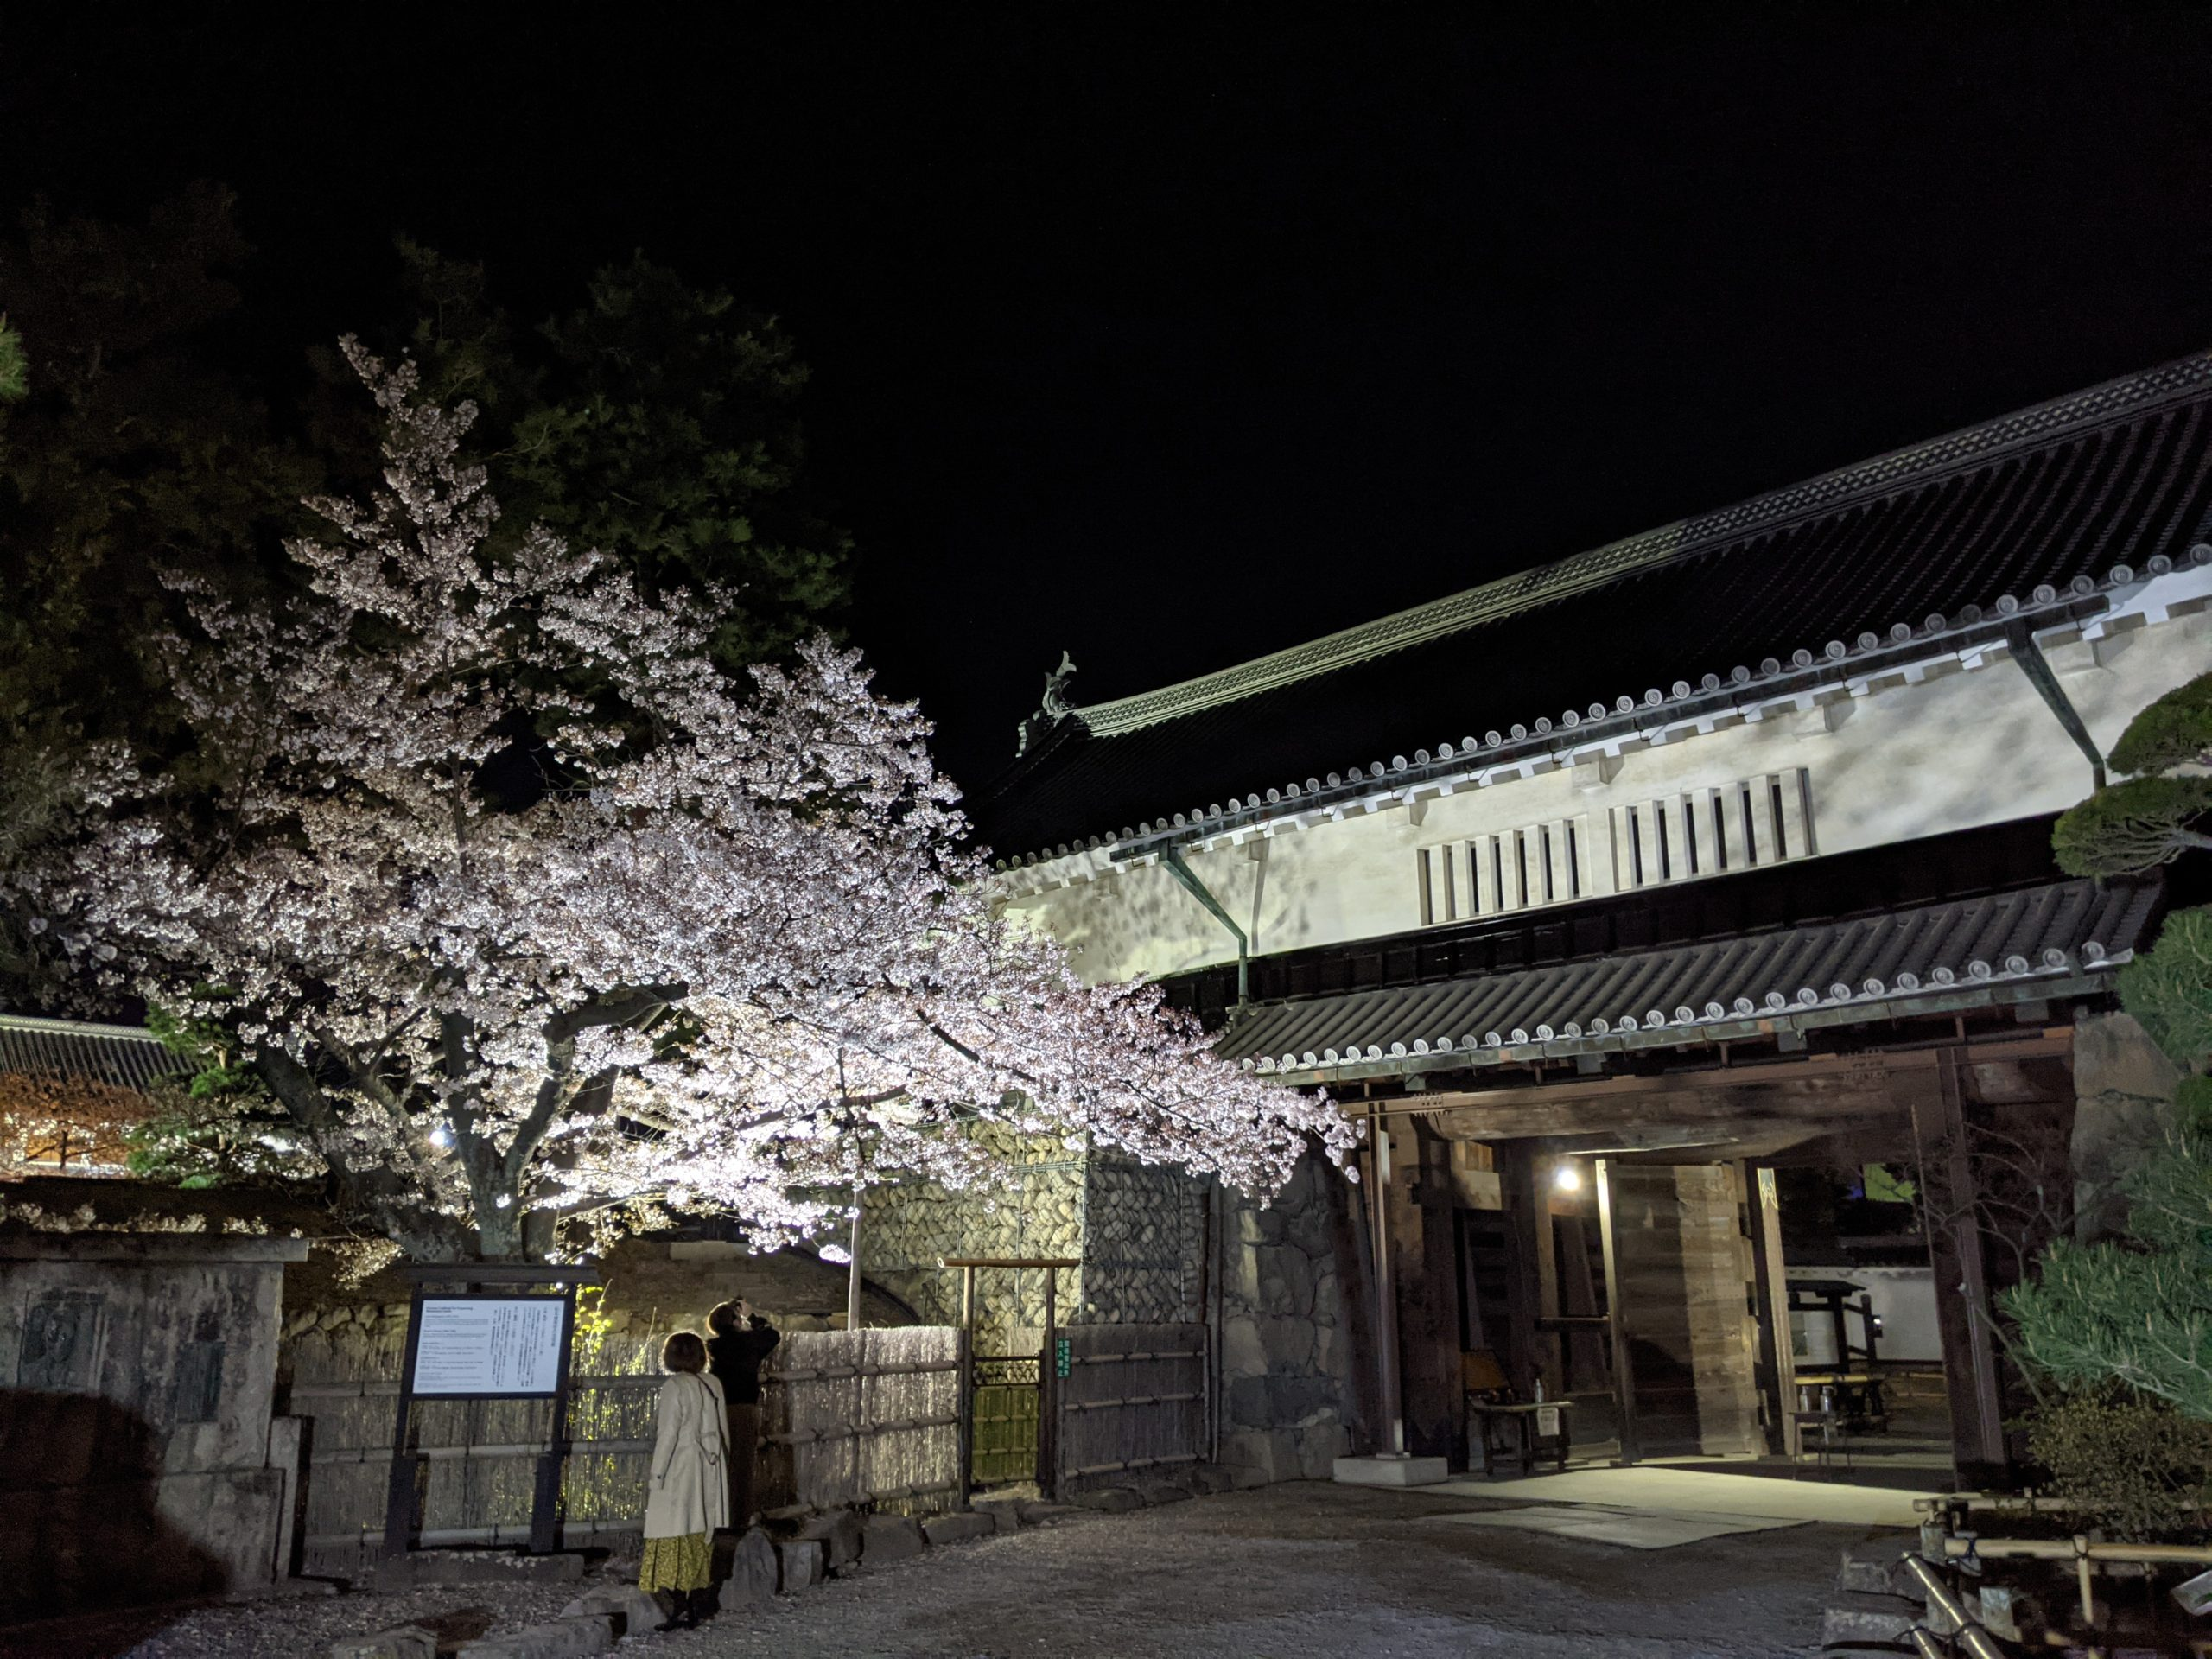 Sakura au Château de Matsumoto floraison